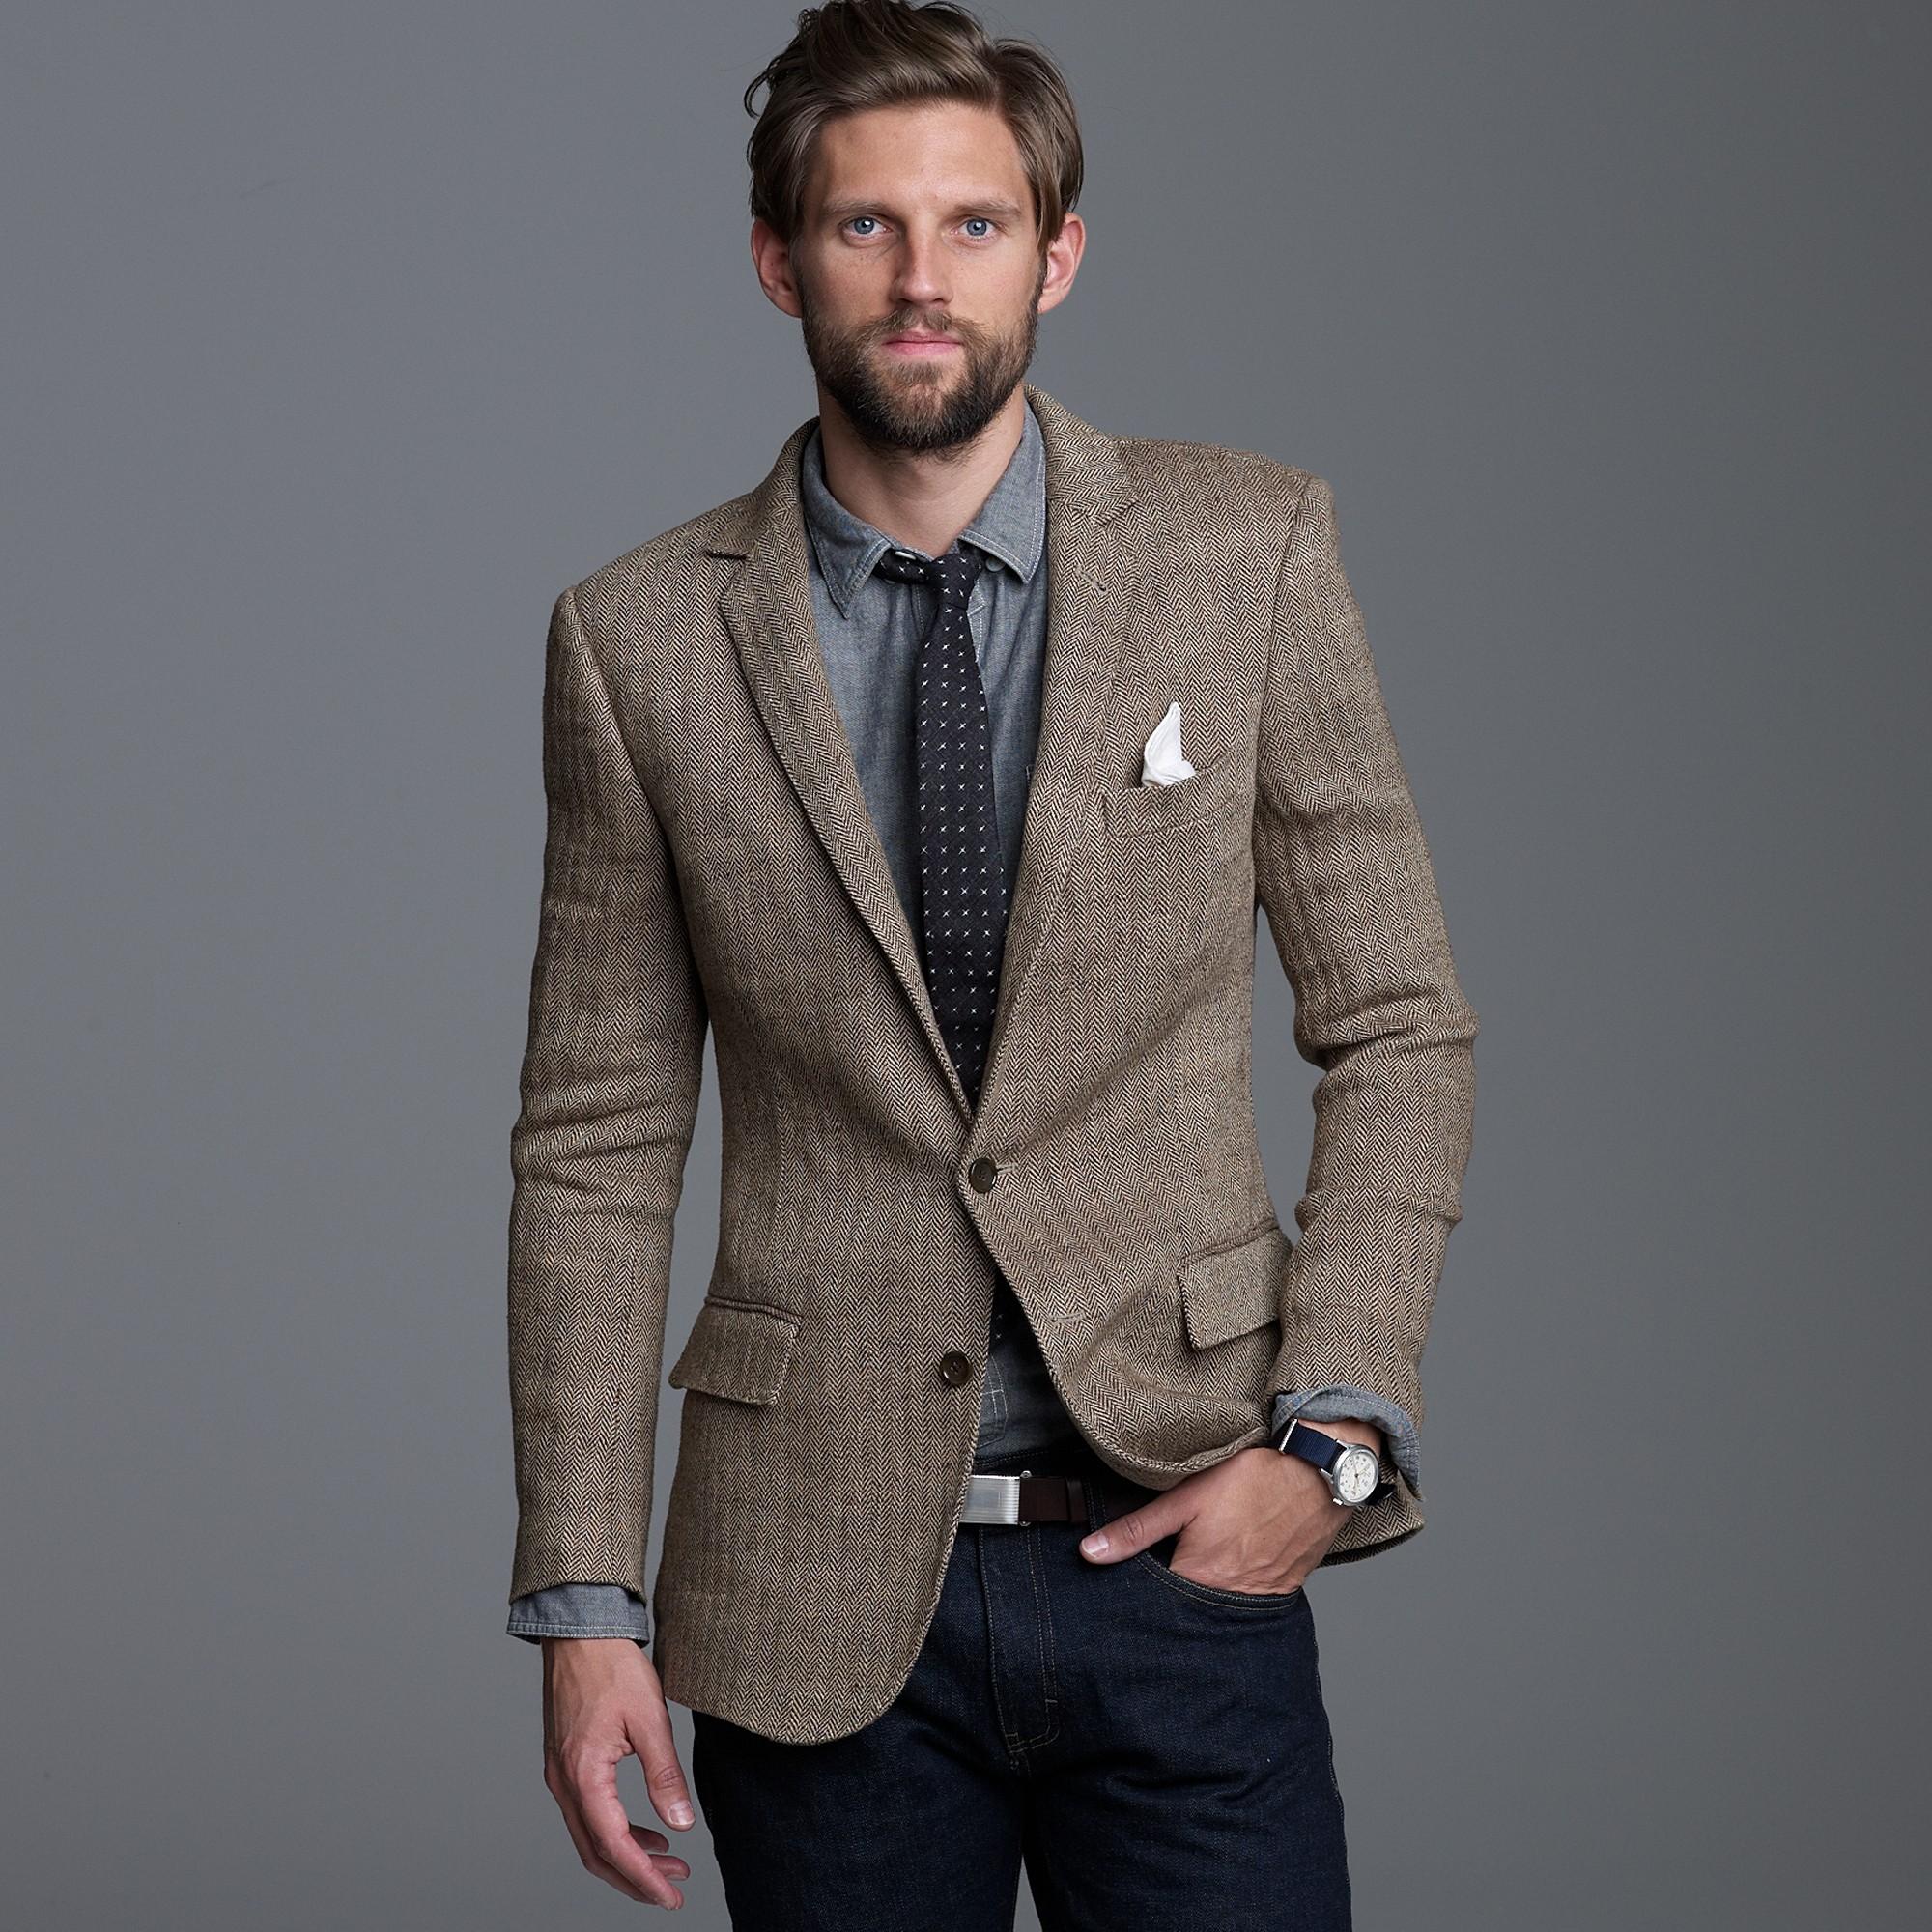 Blazers & Sport Coats Deals: 50 to 90% off deals on Groupon Goods. Elie Milano Italy Slim Fit Solid Velvet Men's Blazer/Jacket V1. Gino Vitale Men's Modern Fit Herringbone Sports Coat.